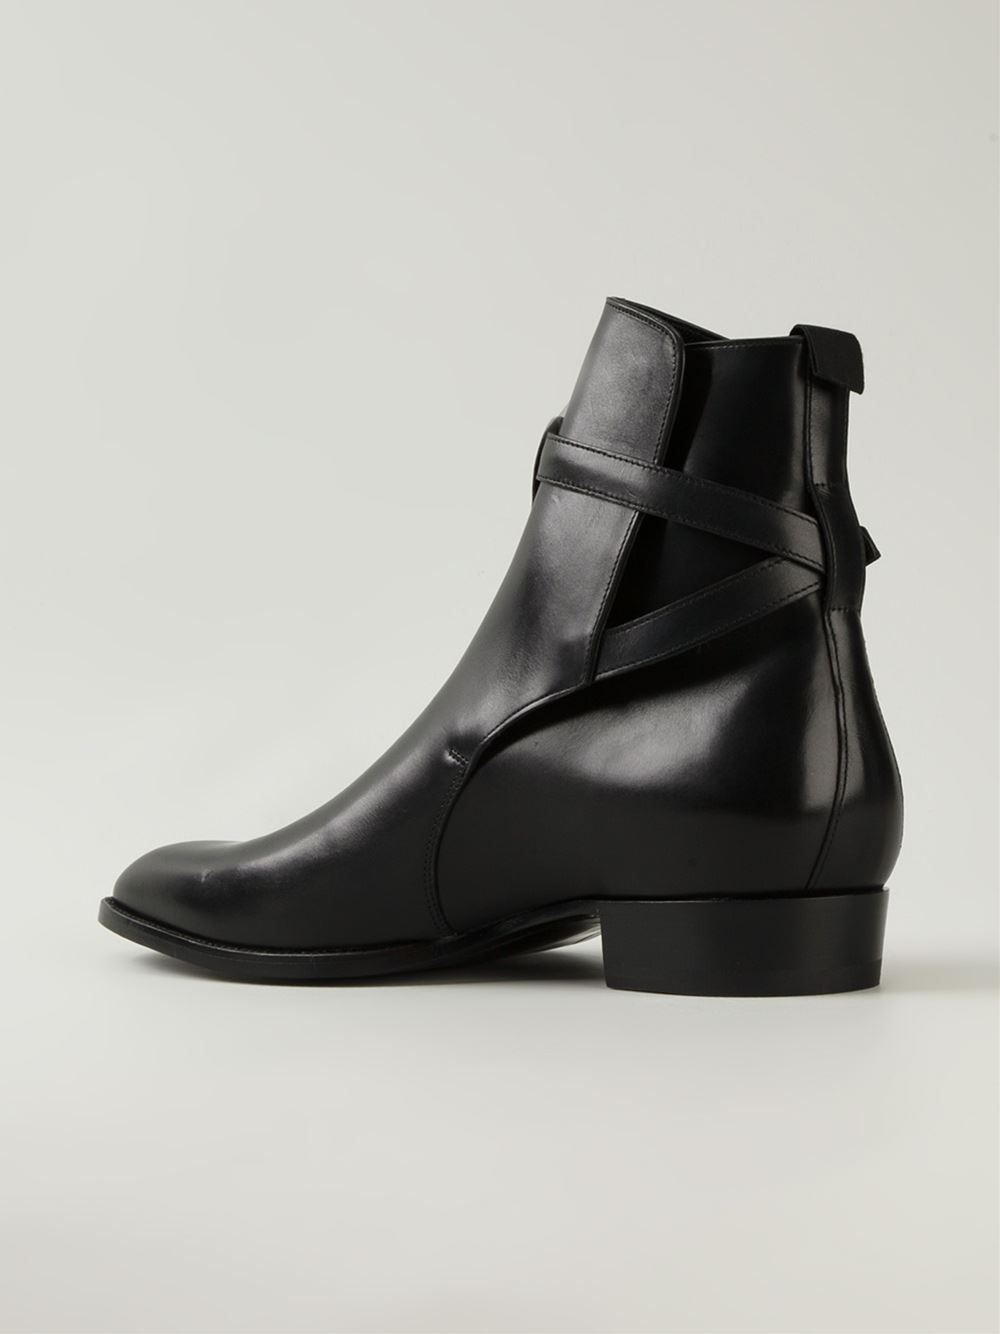 baee8e071f9 Handmade men black jodhpurs ankle boot, Men ankle high leather boot, Men's  boots - Boots